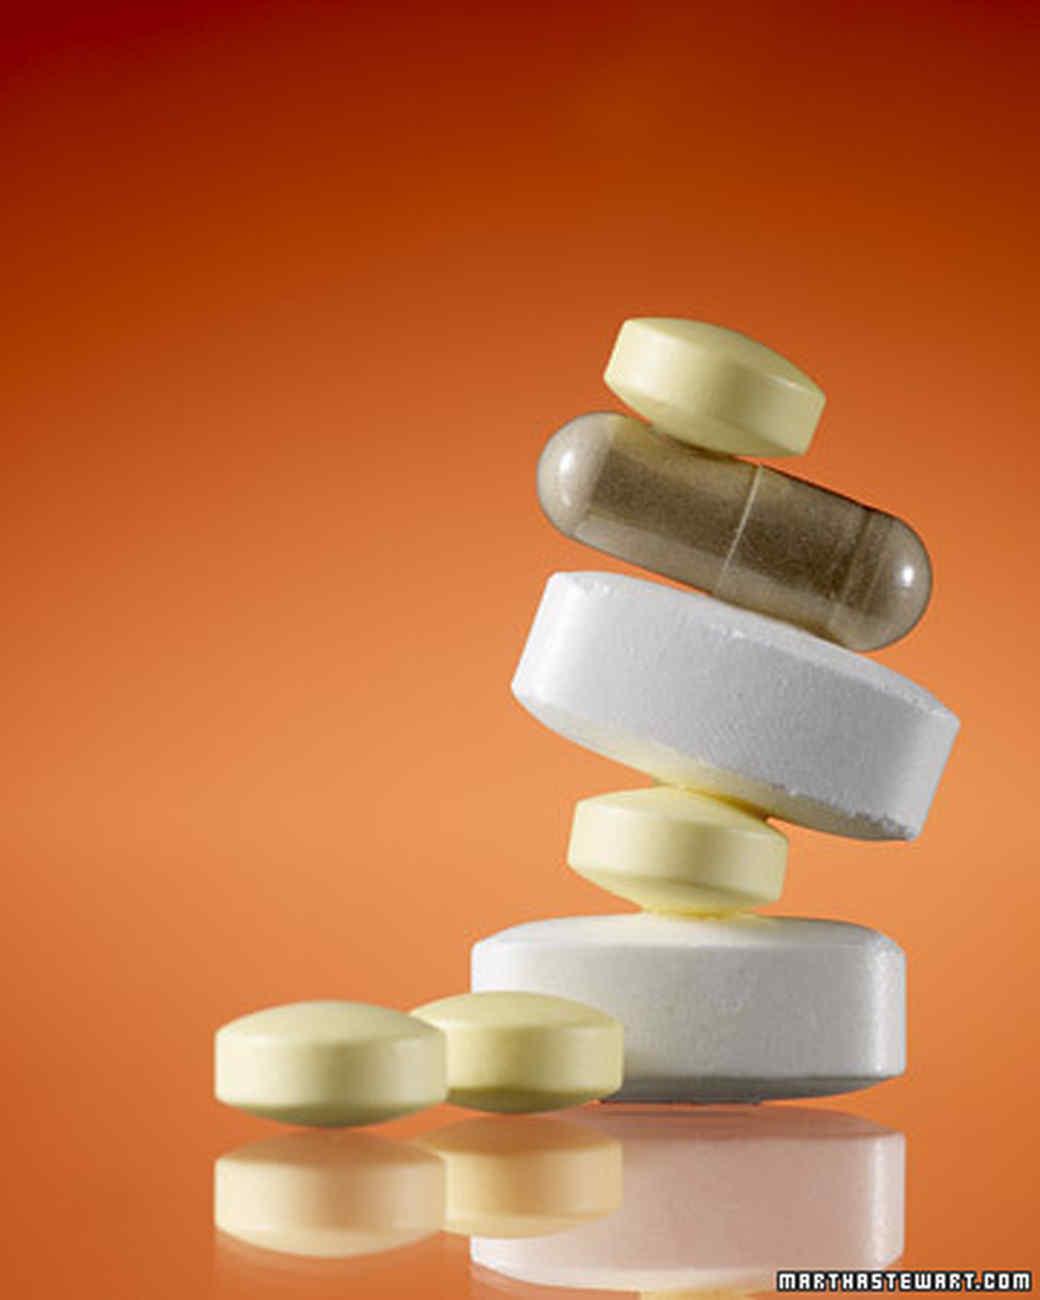 bd103213_0907_vitamins4.jpg